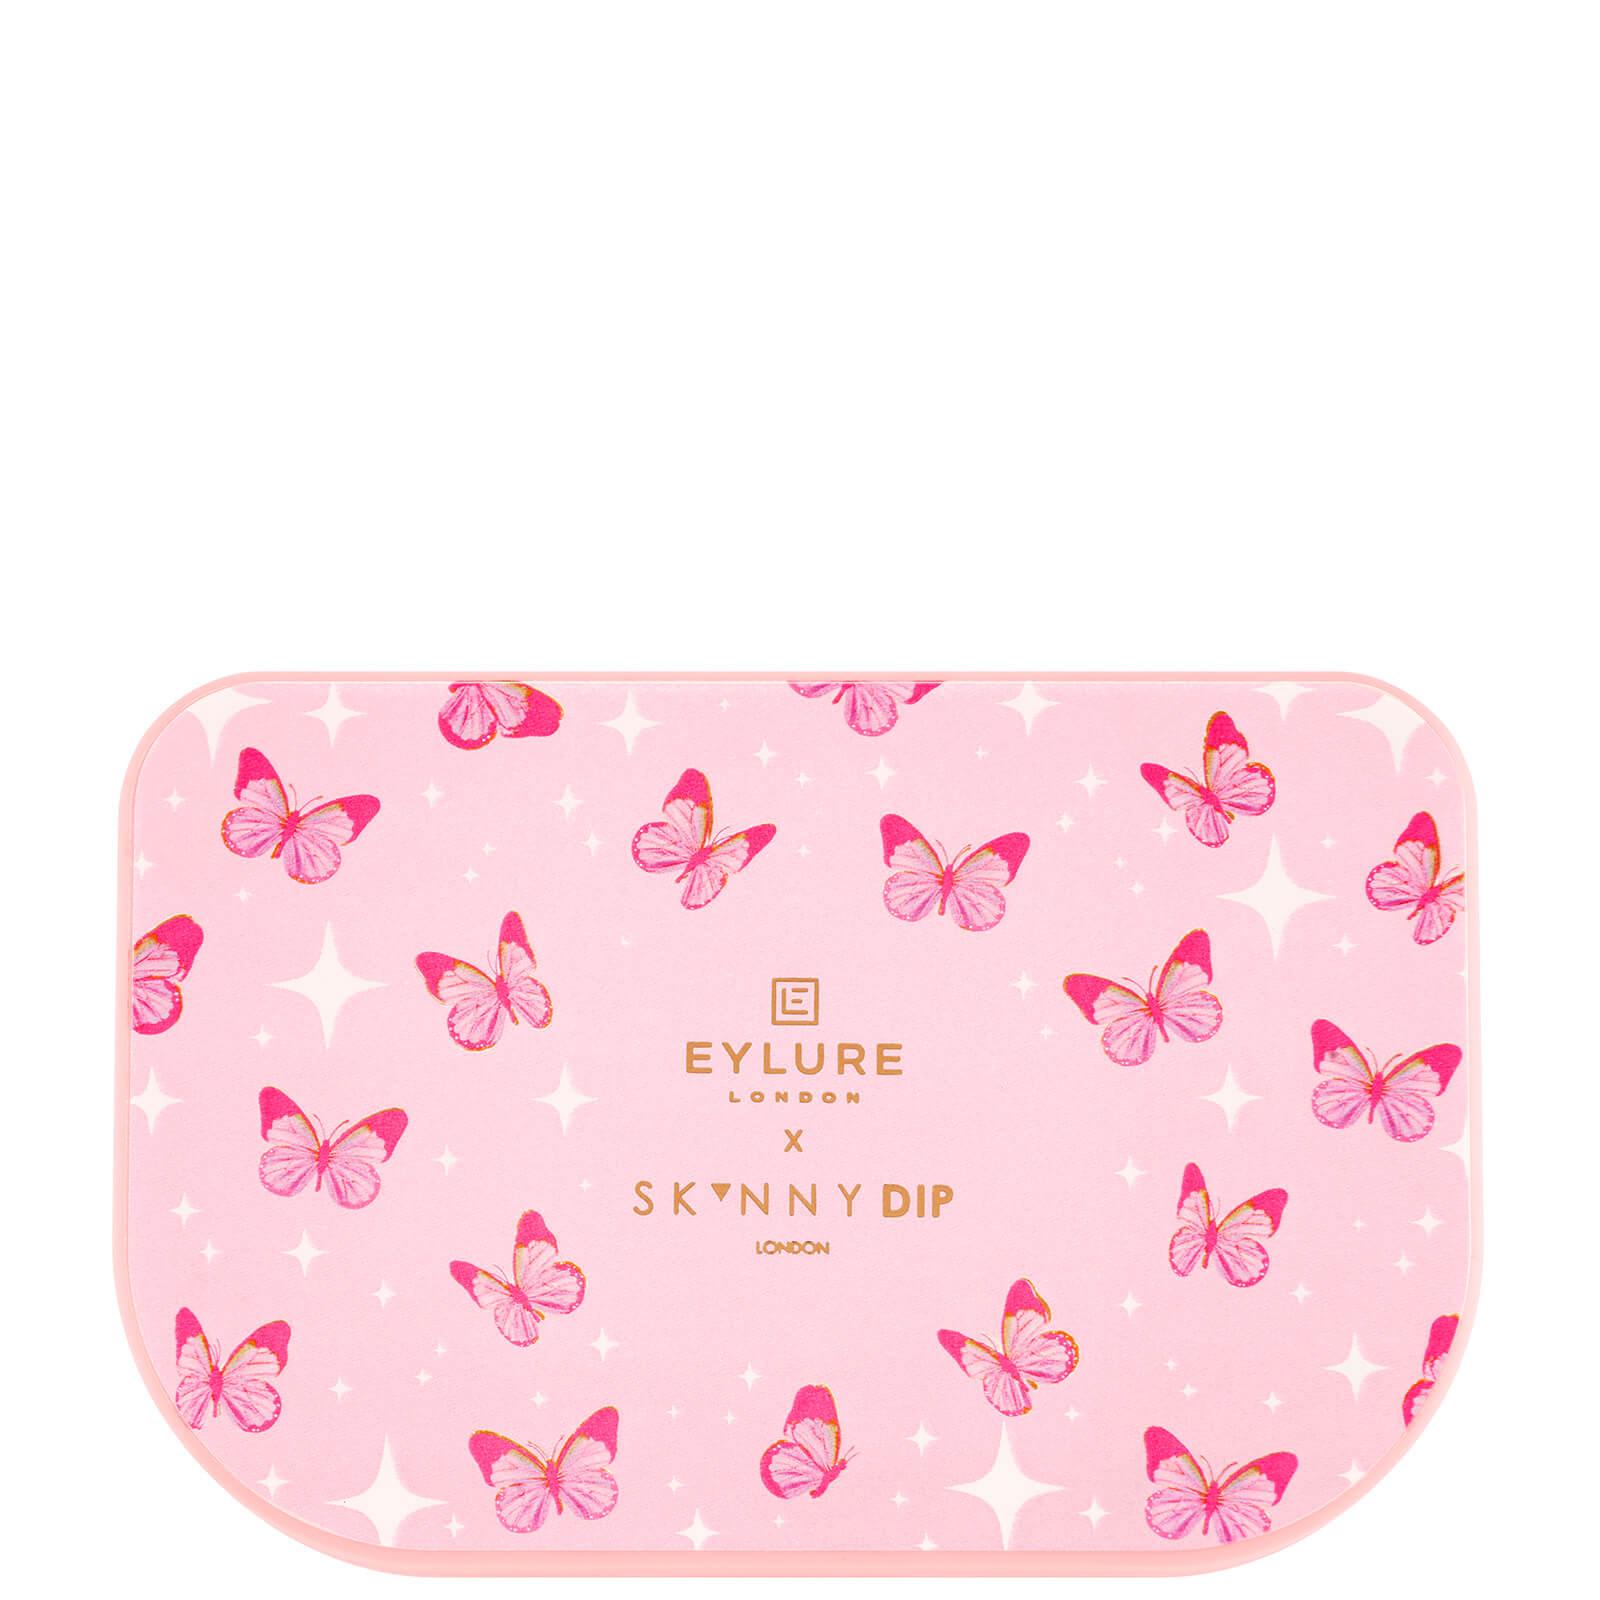 Купить Eylure x Skinnydip Lash Case Butterfly